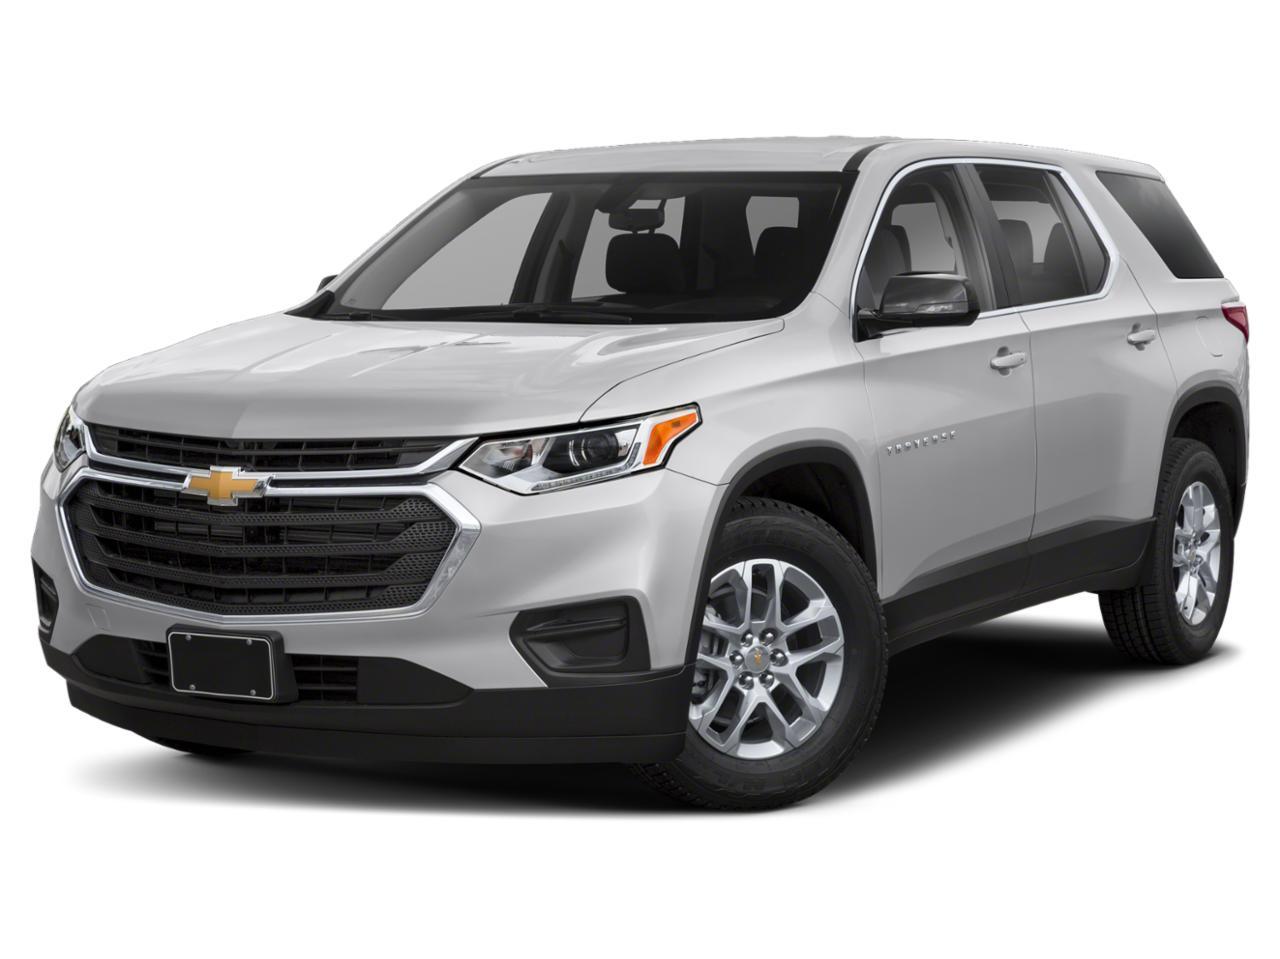 2018 Chevrolet Traverse Vehicle Photo in American Fork, UT 84003